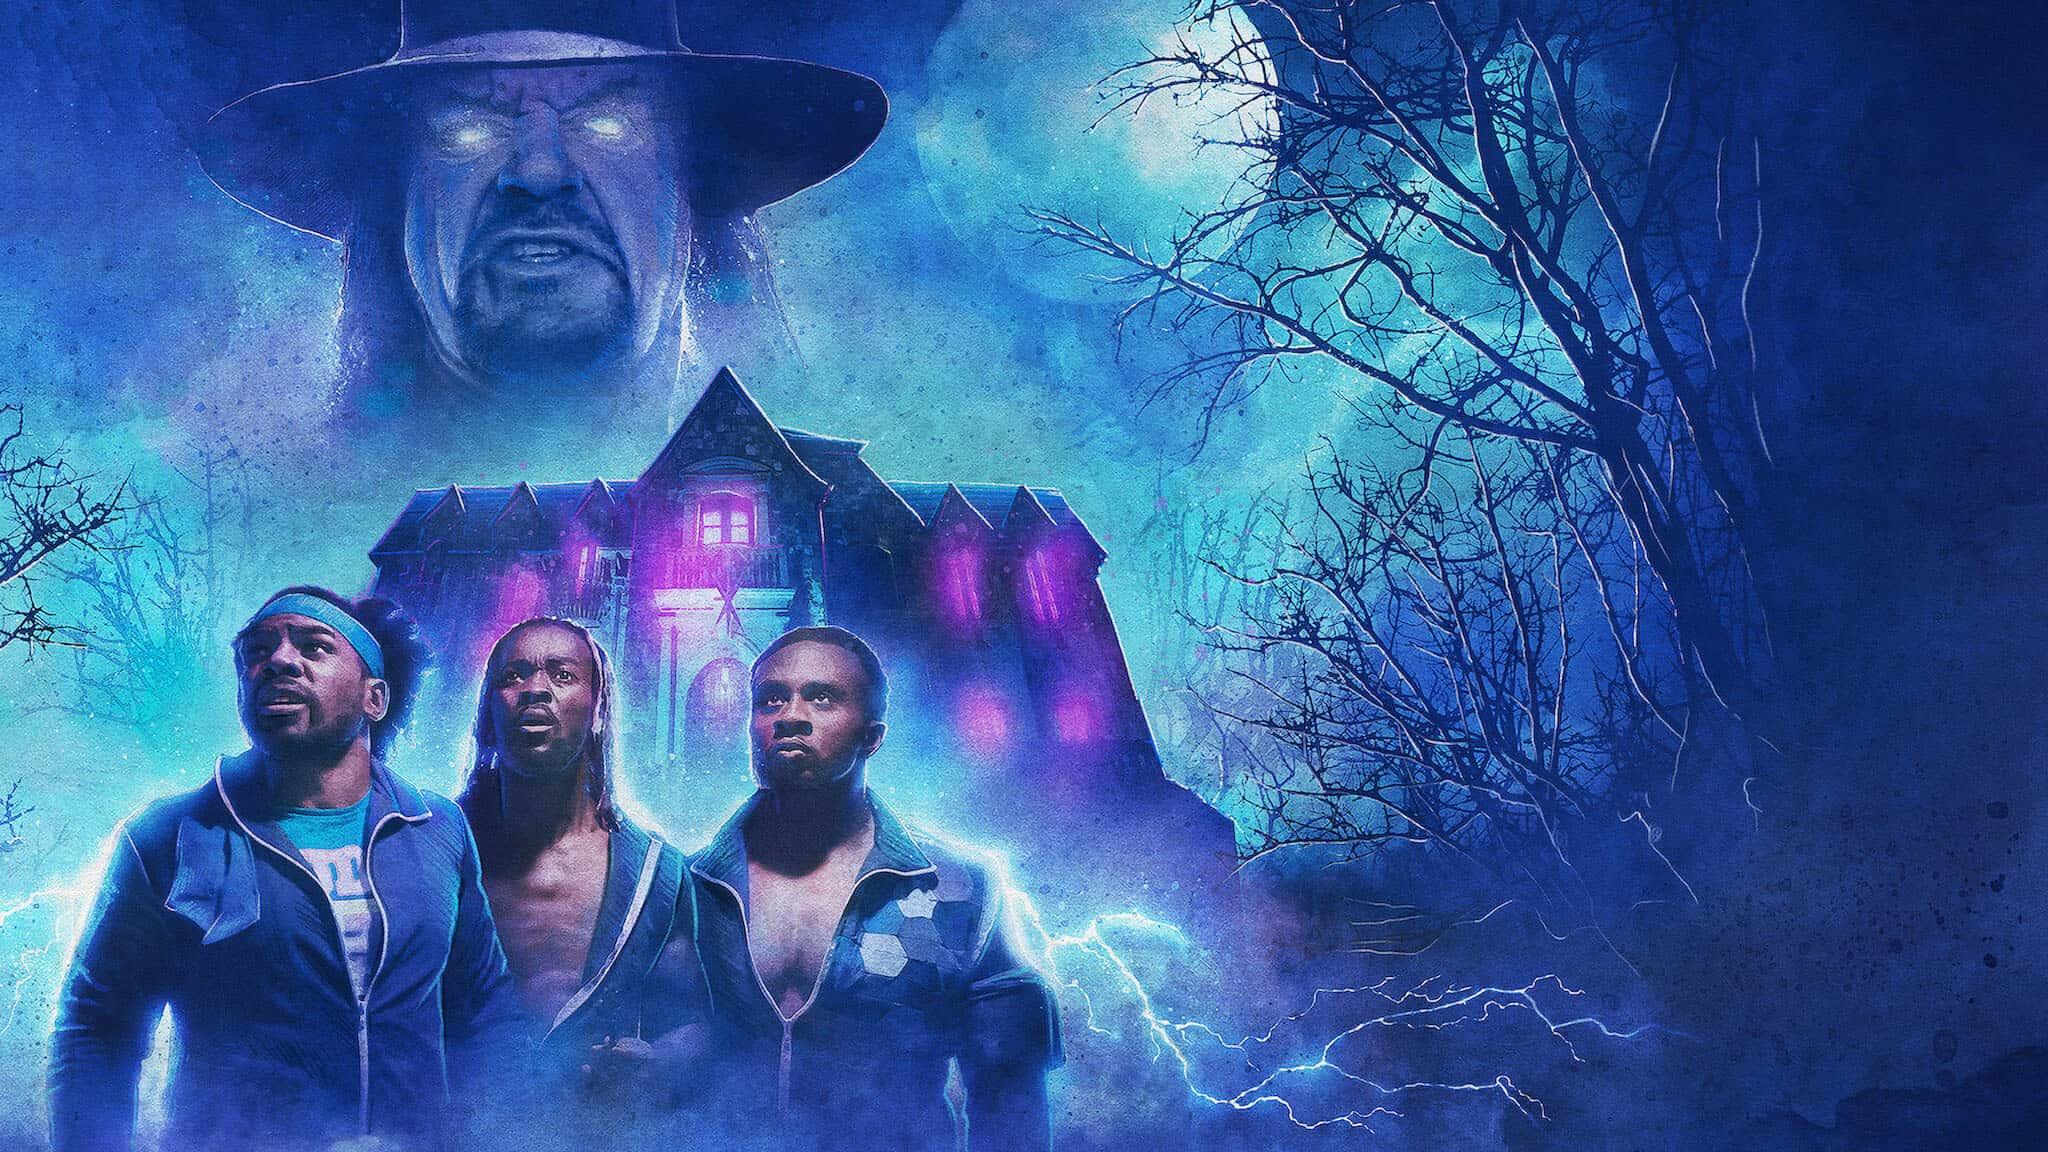 فيلم Escape The Undertaker 2021 مترجم